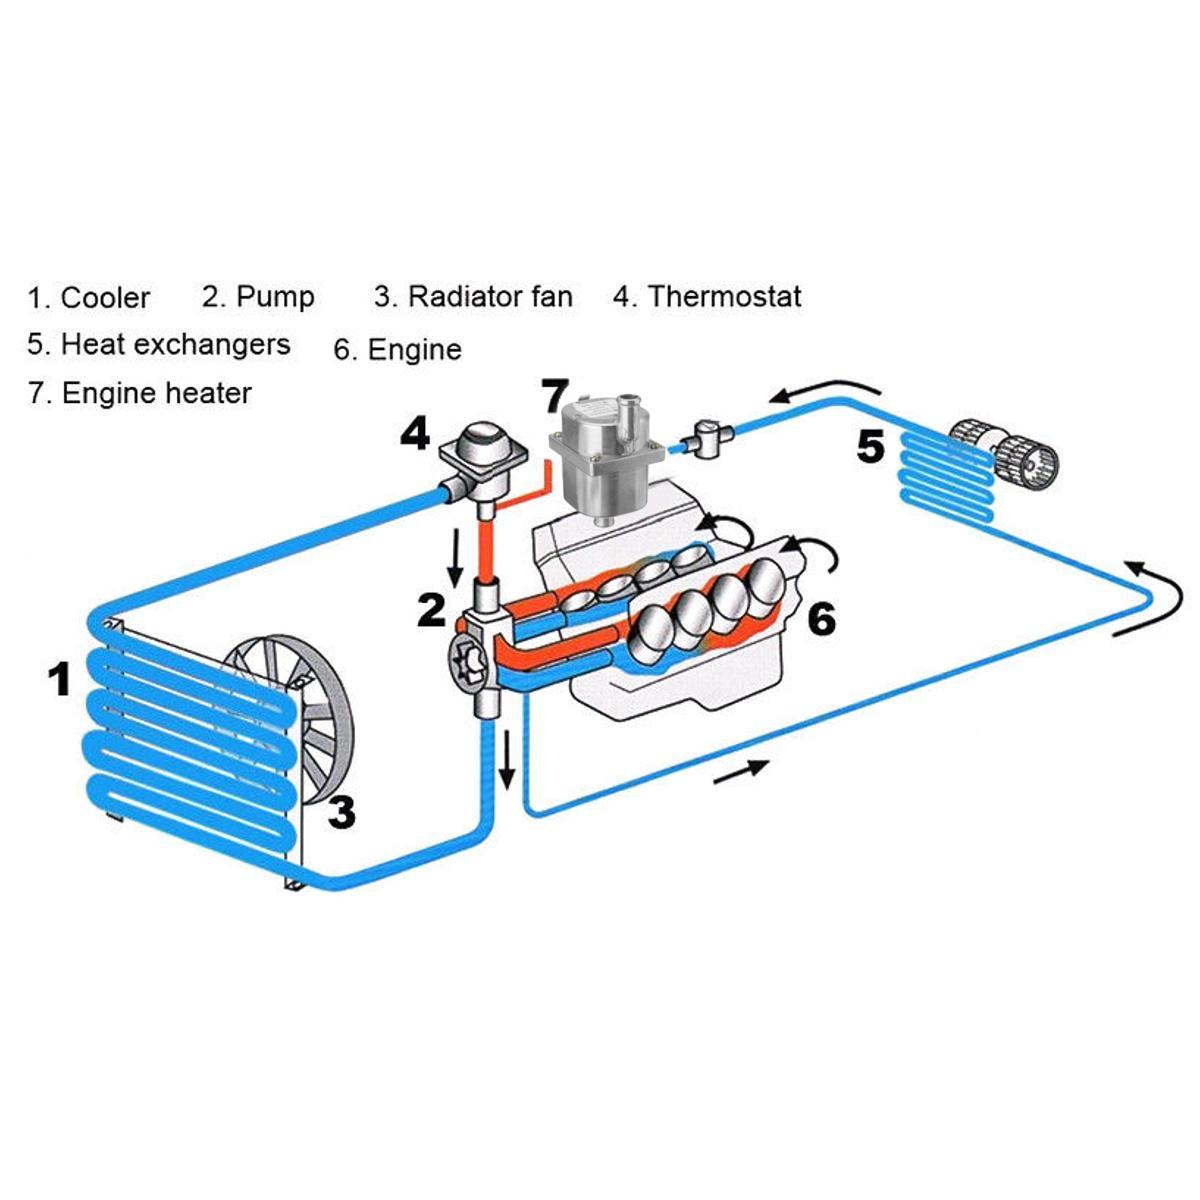 hight resolution of 3000w car engine coolant heater preheater not w ebasto eberspacher motor heating preheating air parking heater in heating fans from automobiles